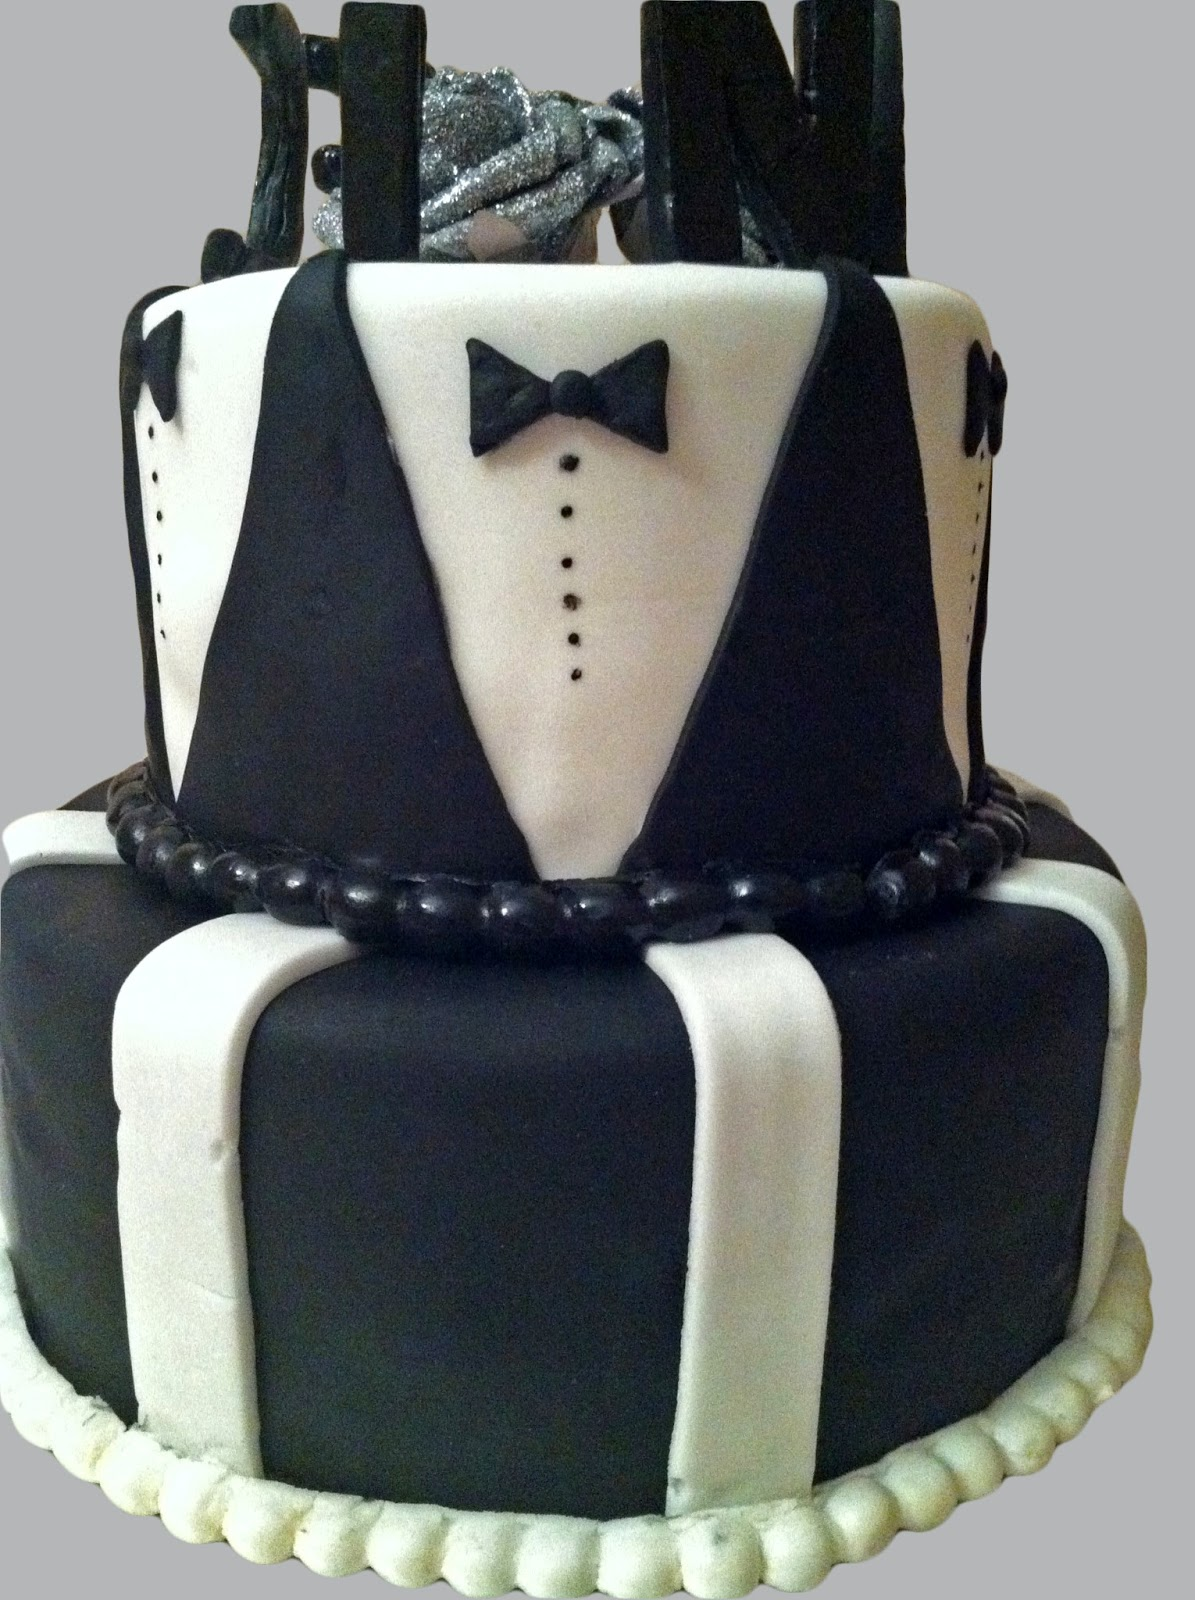 g teau d 39 anniversaire costume mam 39 zelle cakes. Black Bedroom Furniture Sets. Home Design Ideas